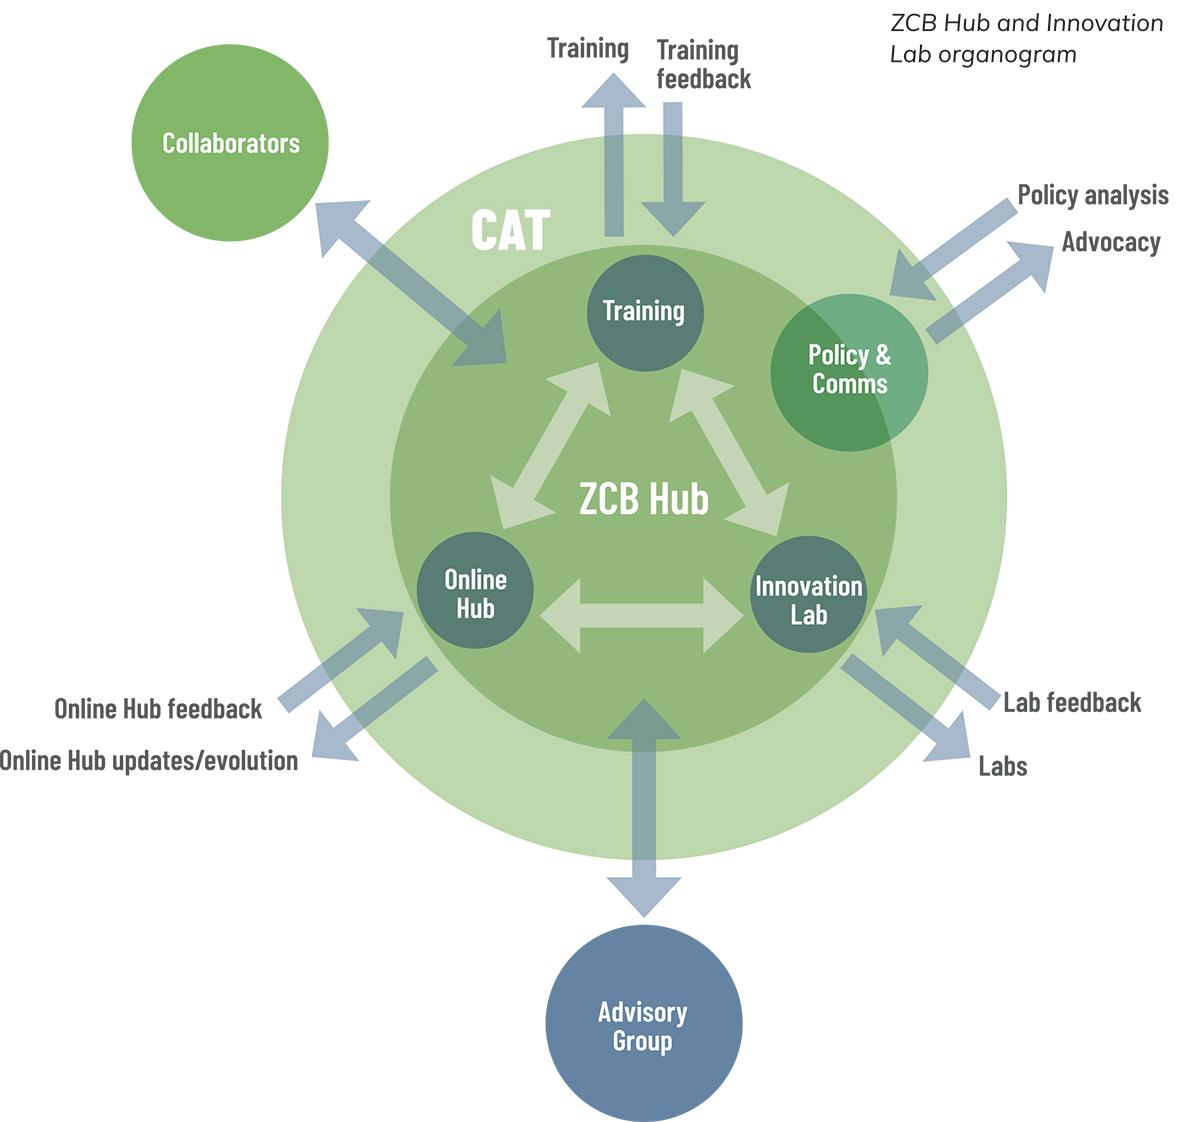 ZCB Hub and Innovation Lab organogram.